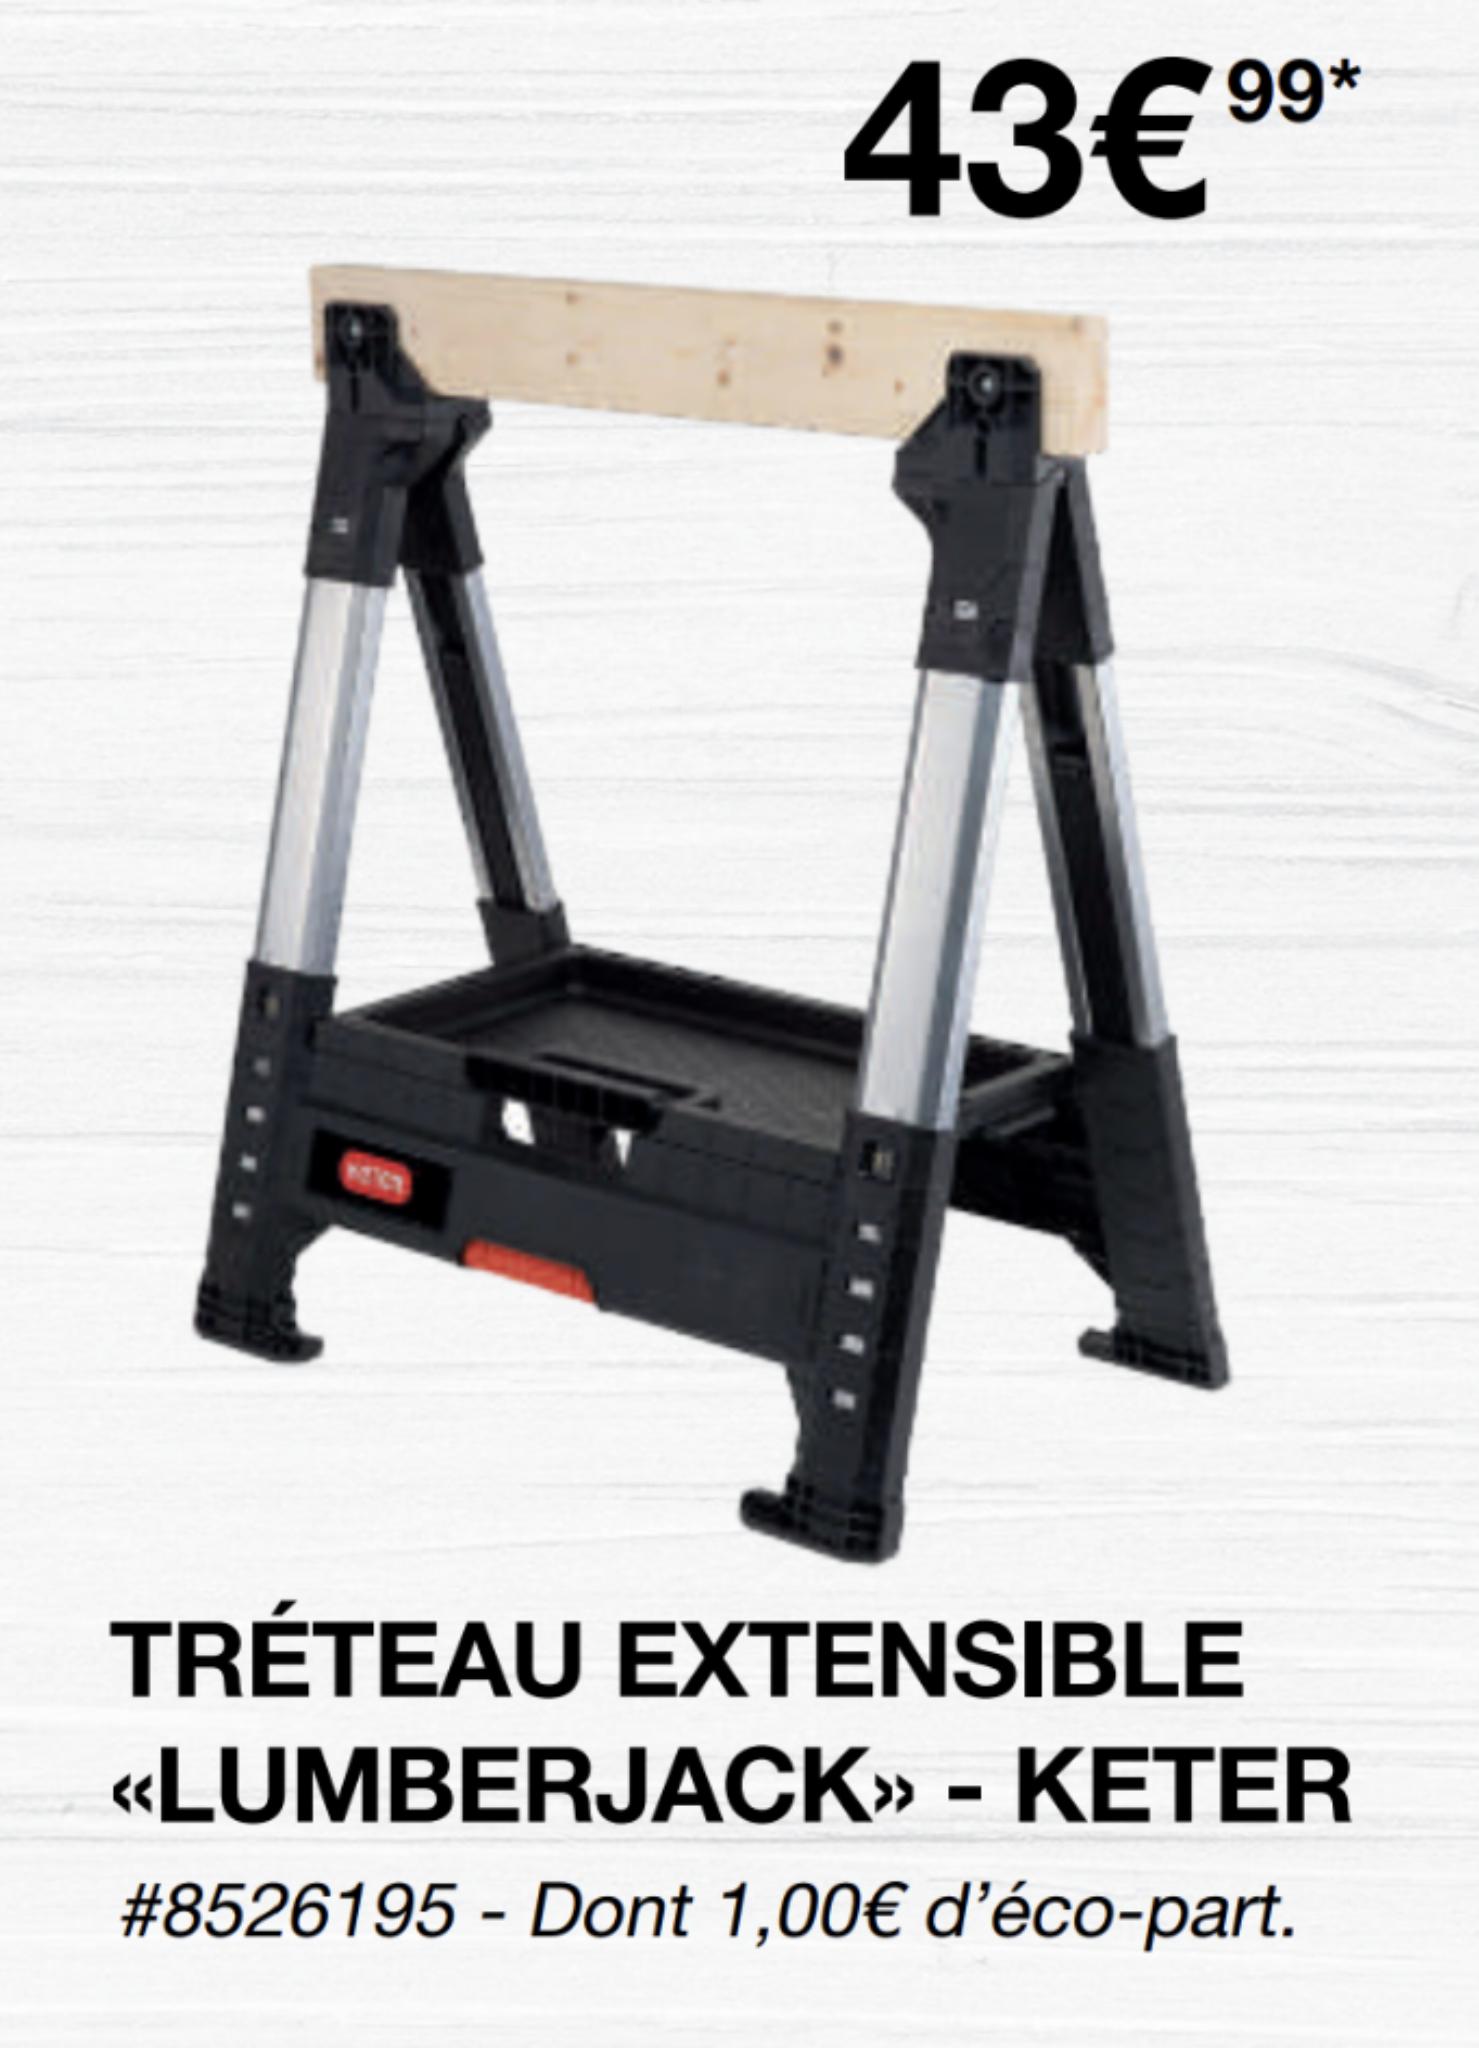 [Carte Costco] Tréteau Extensible Keter Lumberjack - Villebon-sur-Yvette (91)